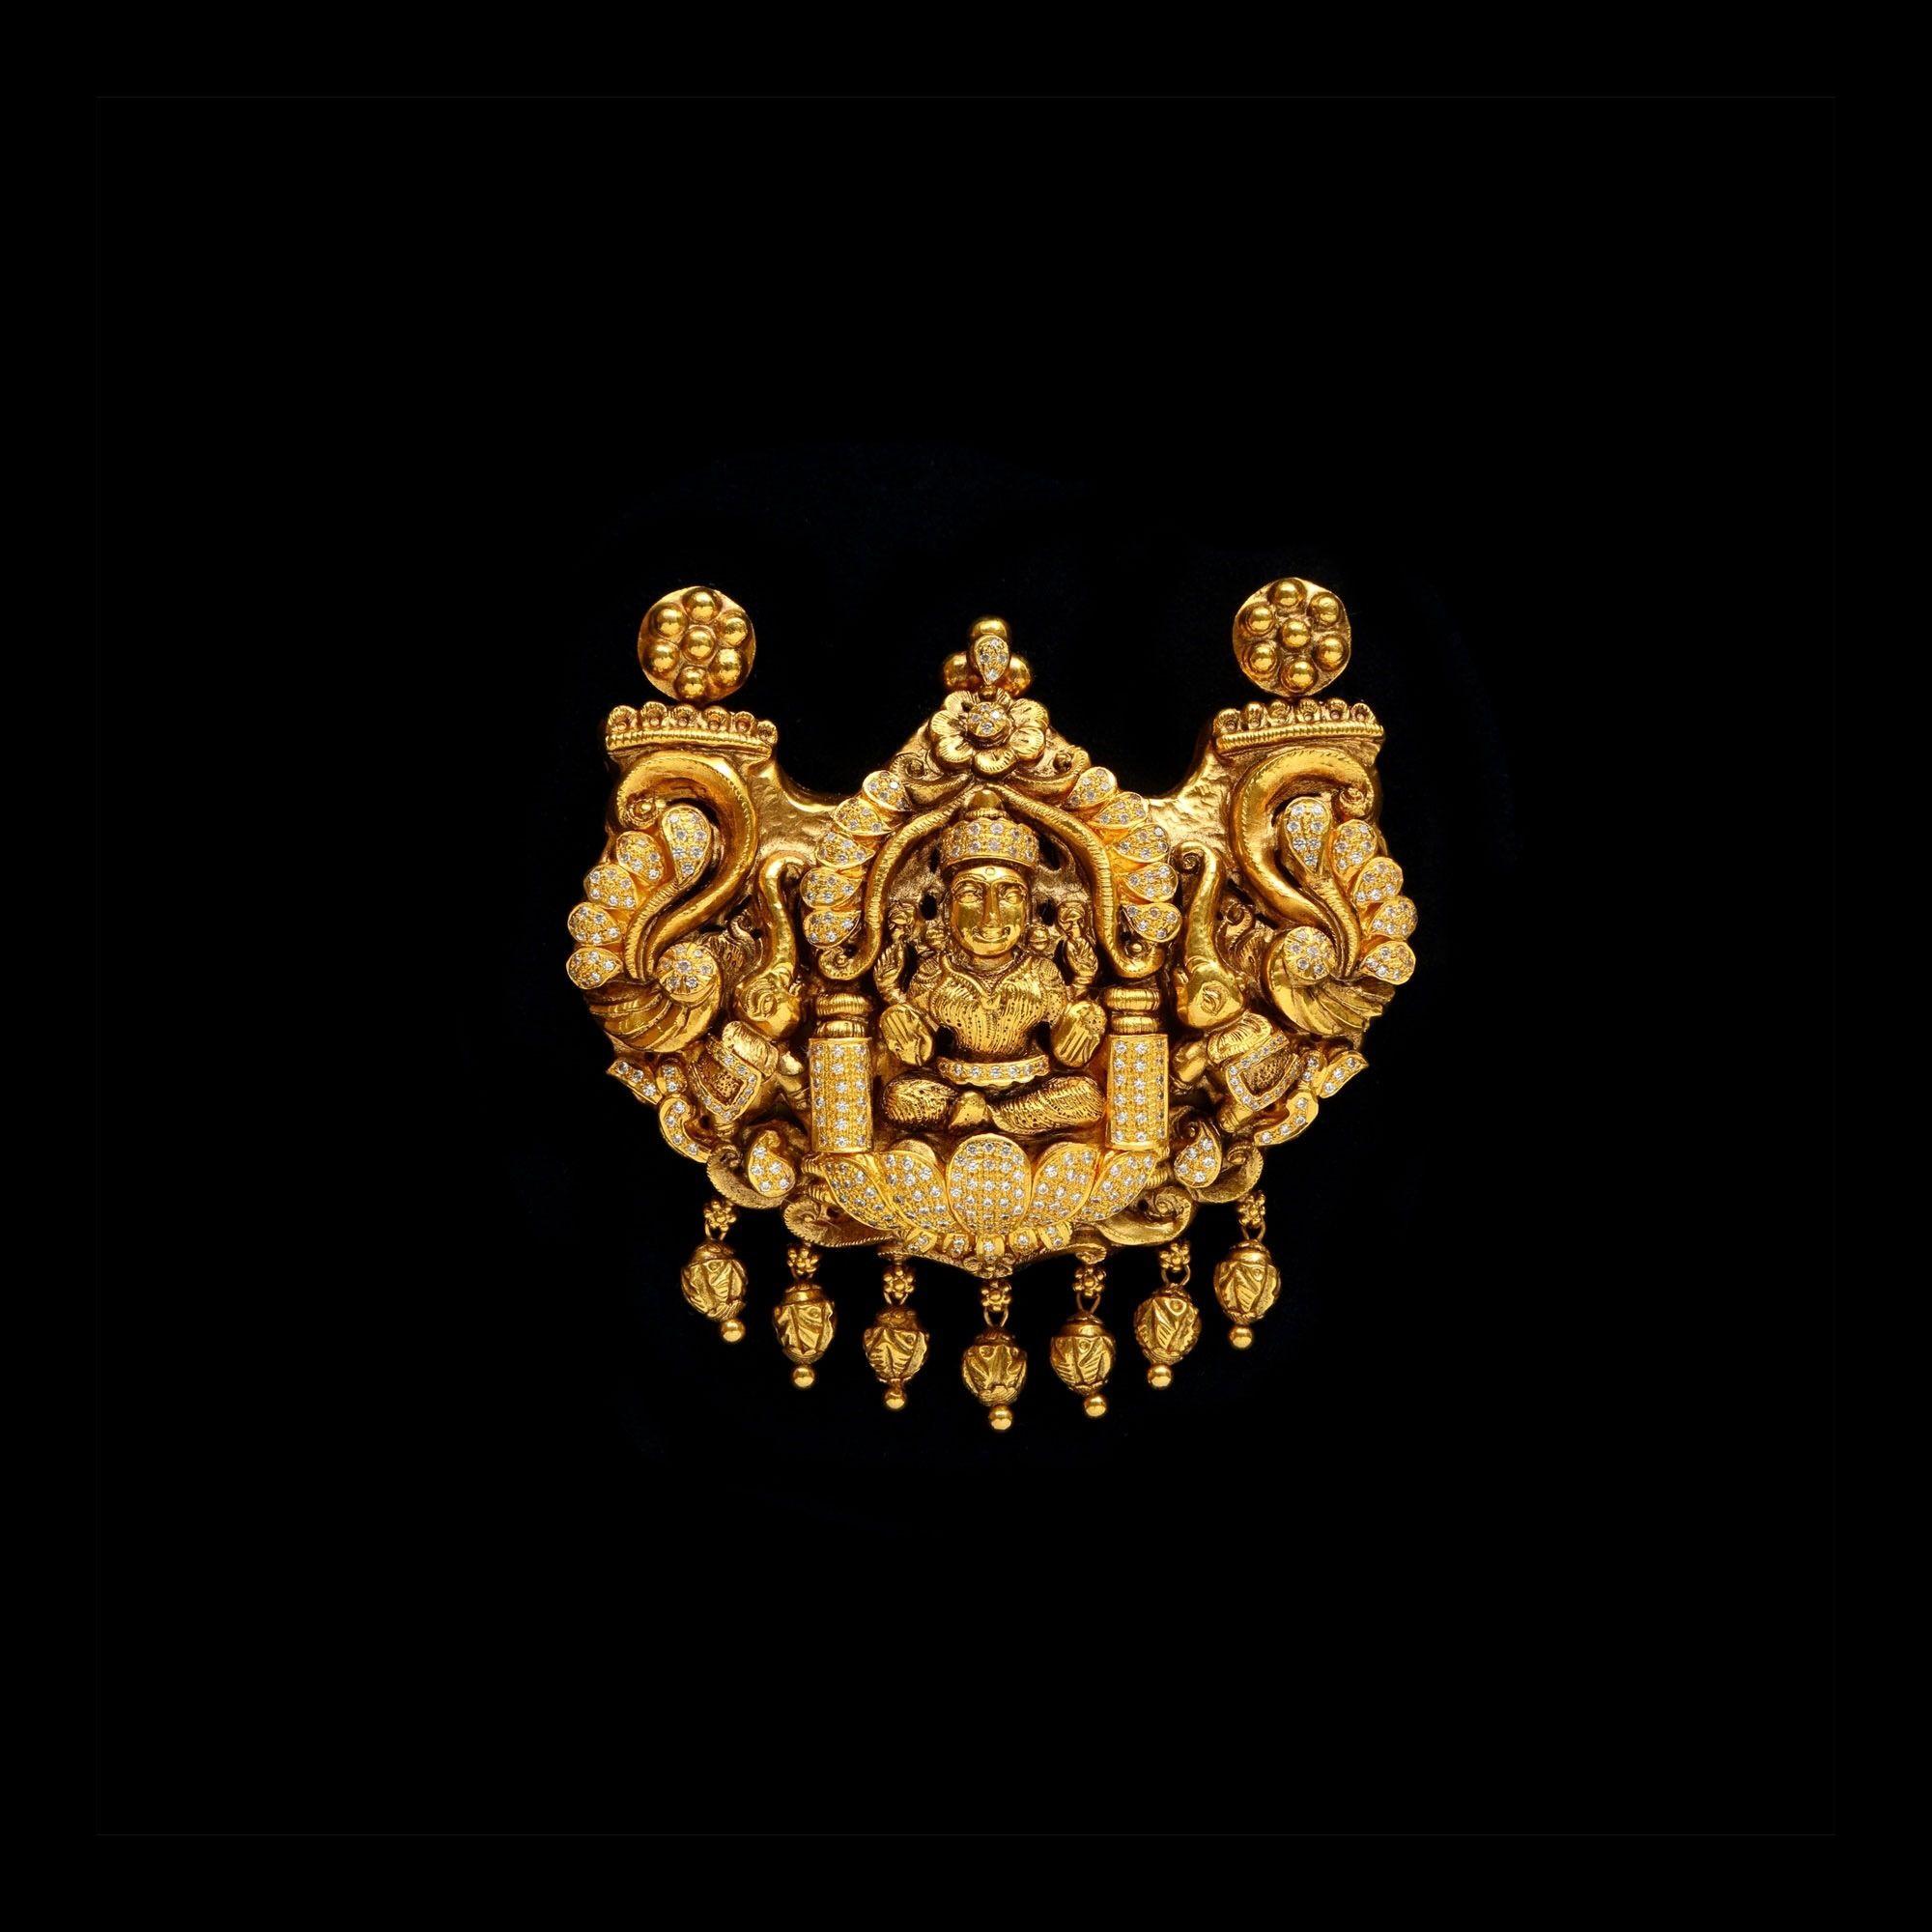 Gold Necklace brilliantcuT goldjewellery templejewellery bridal